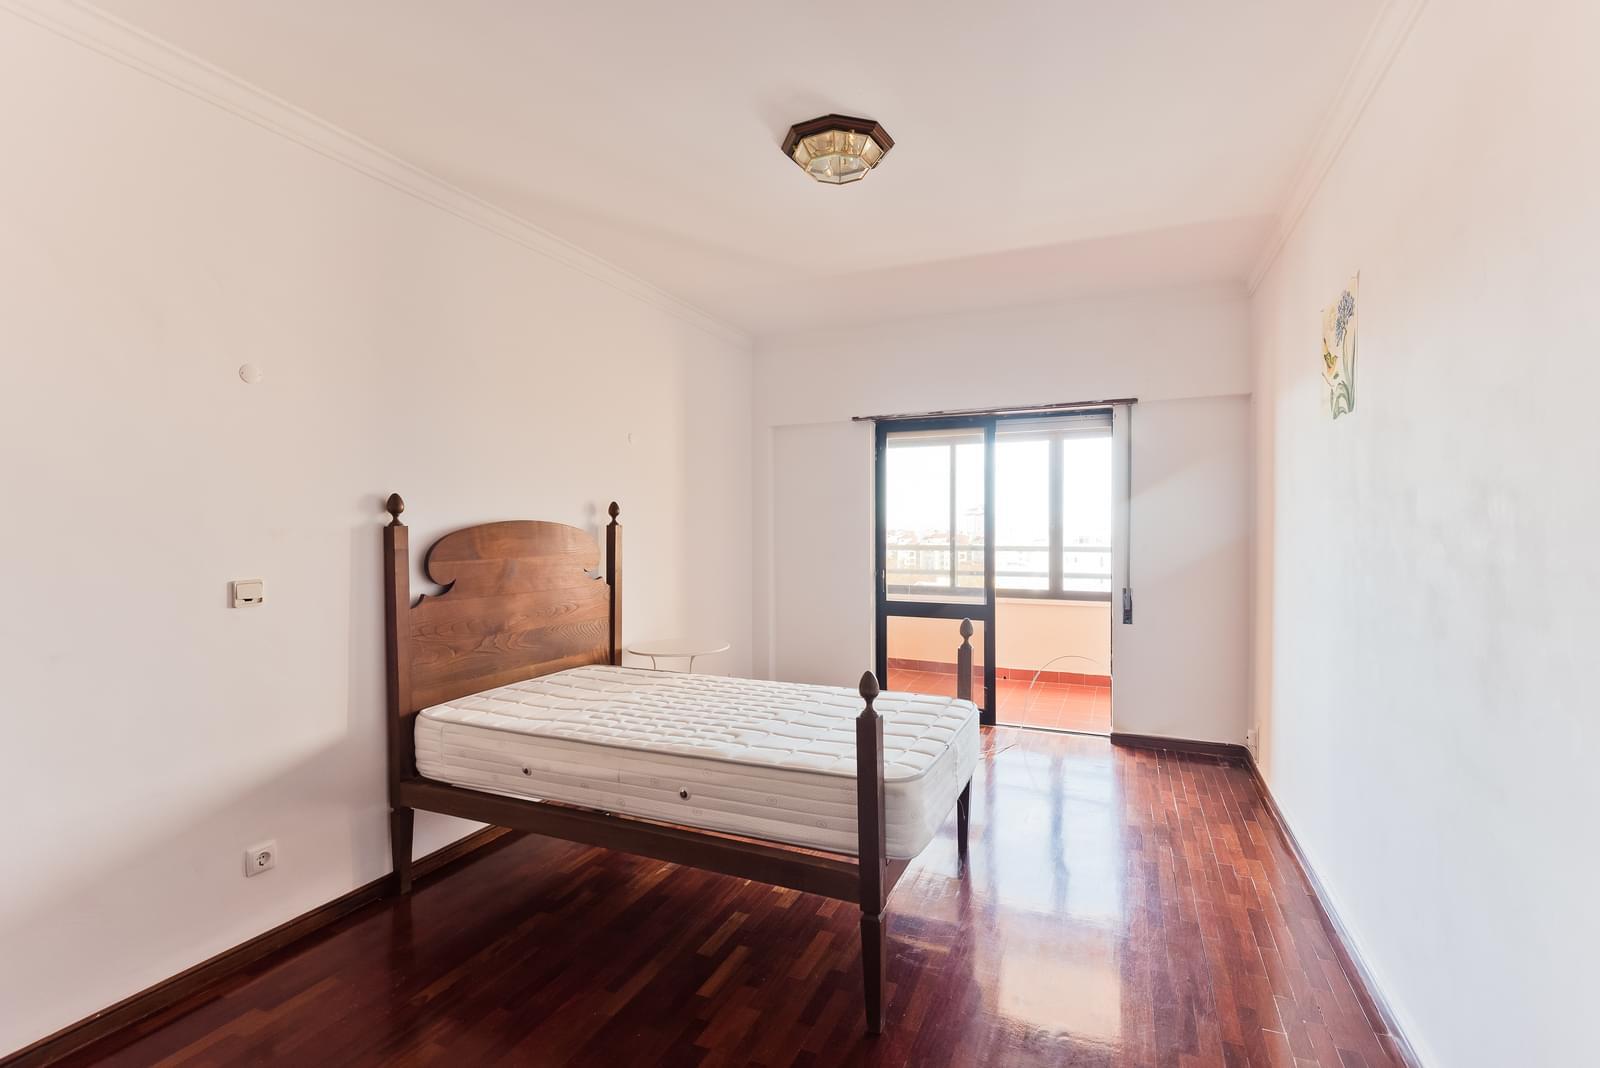 pf18730-apartamento-t2-cascais-3644623c-f427-4931-af4d-7f78c4bc1b70